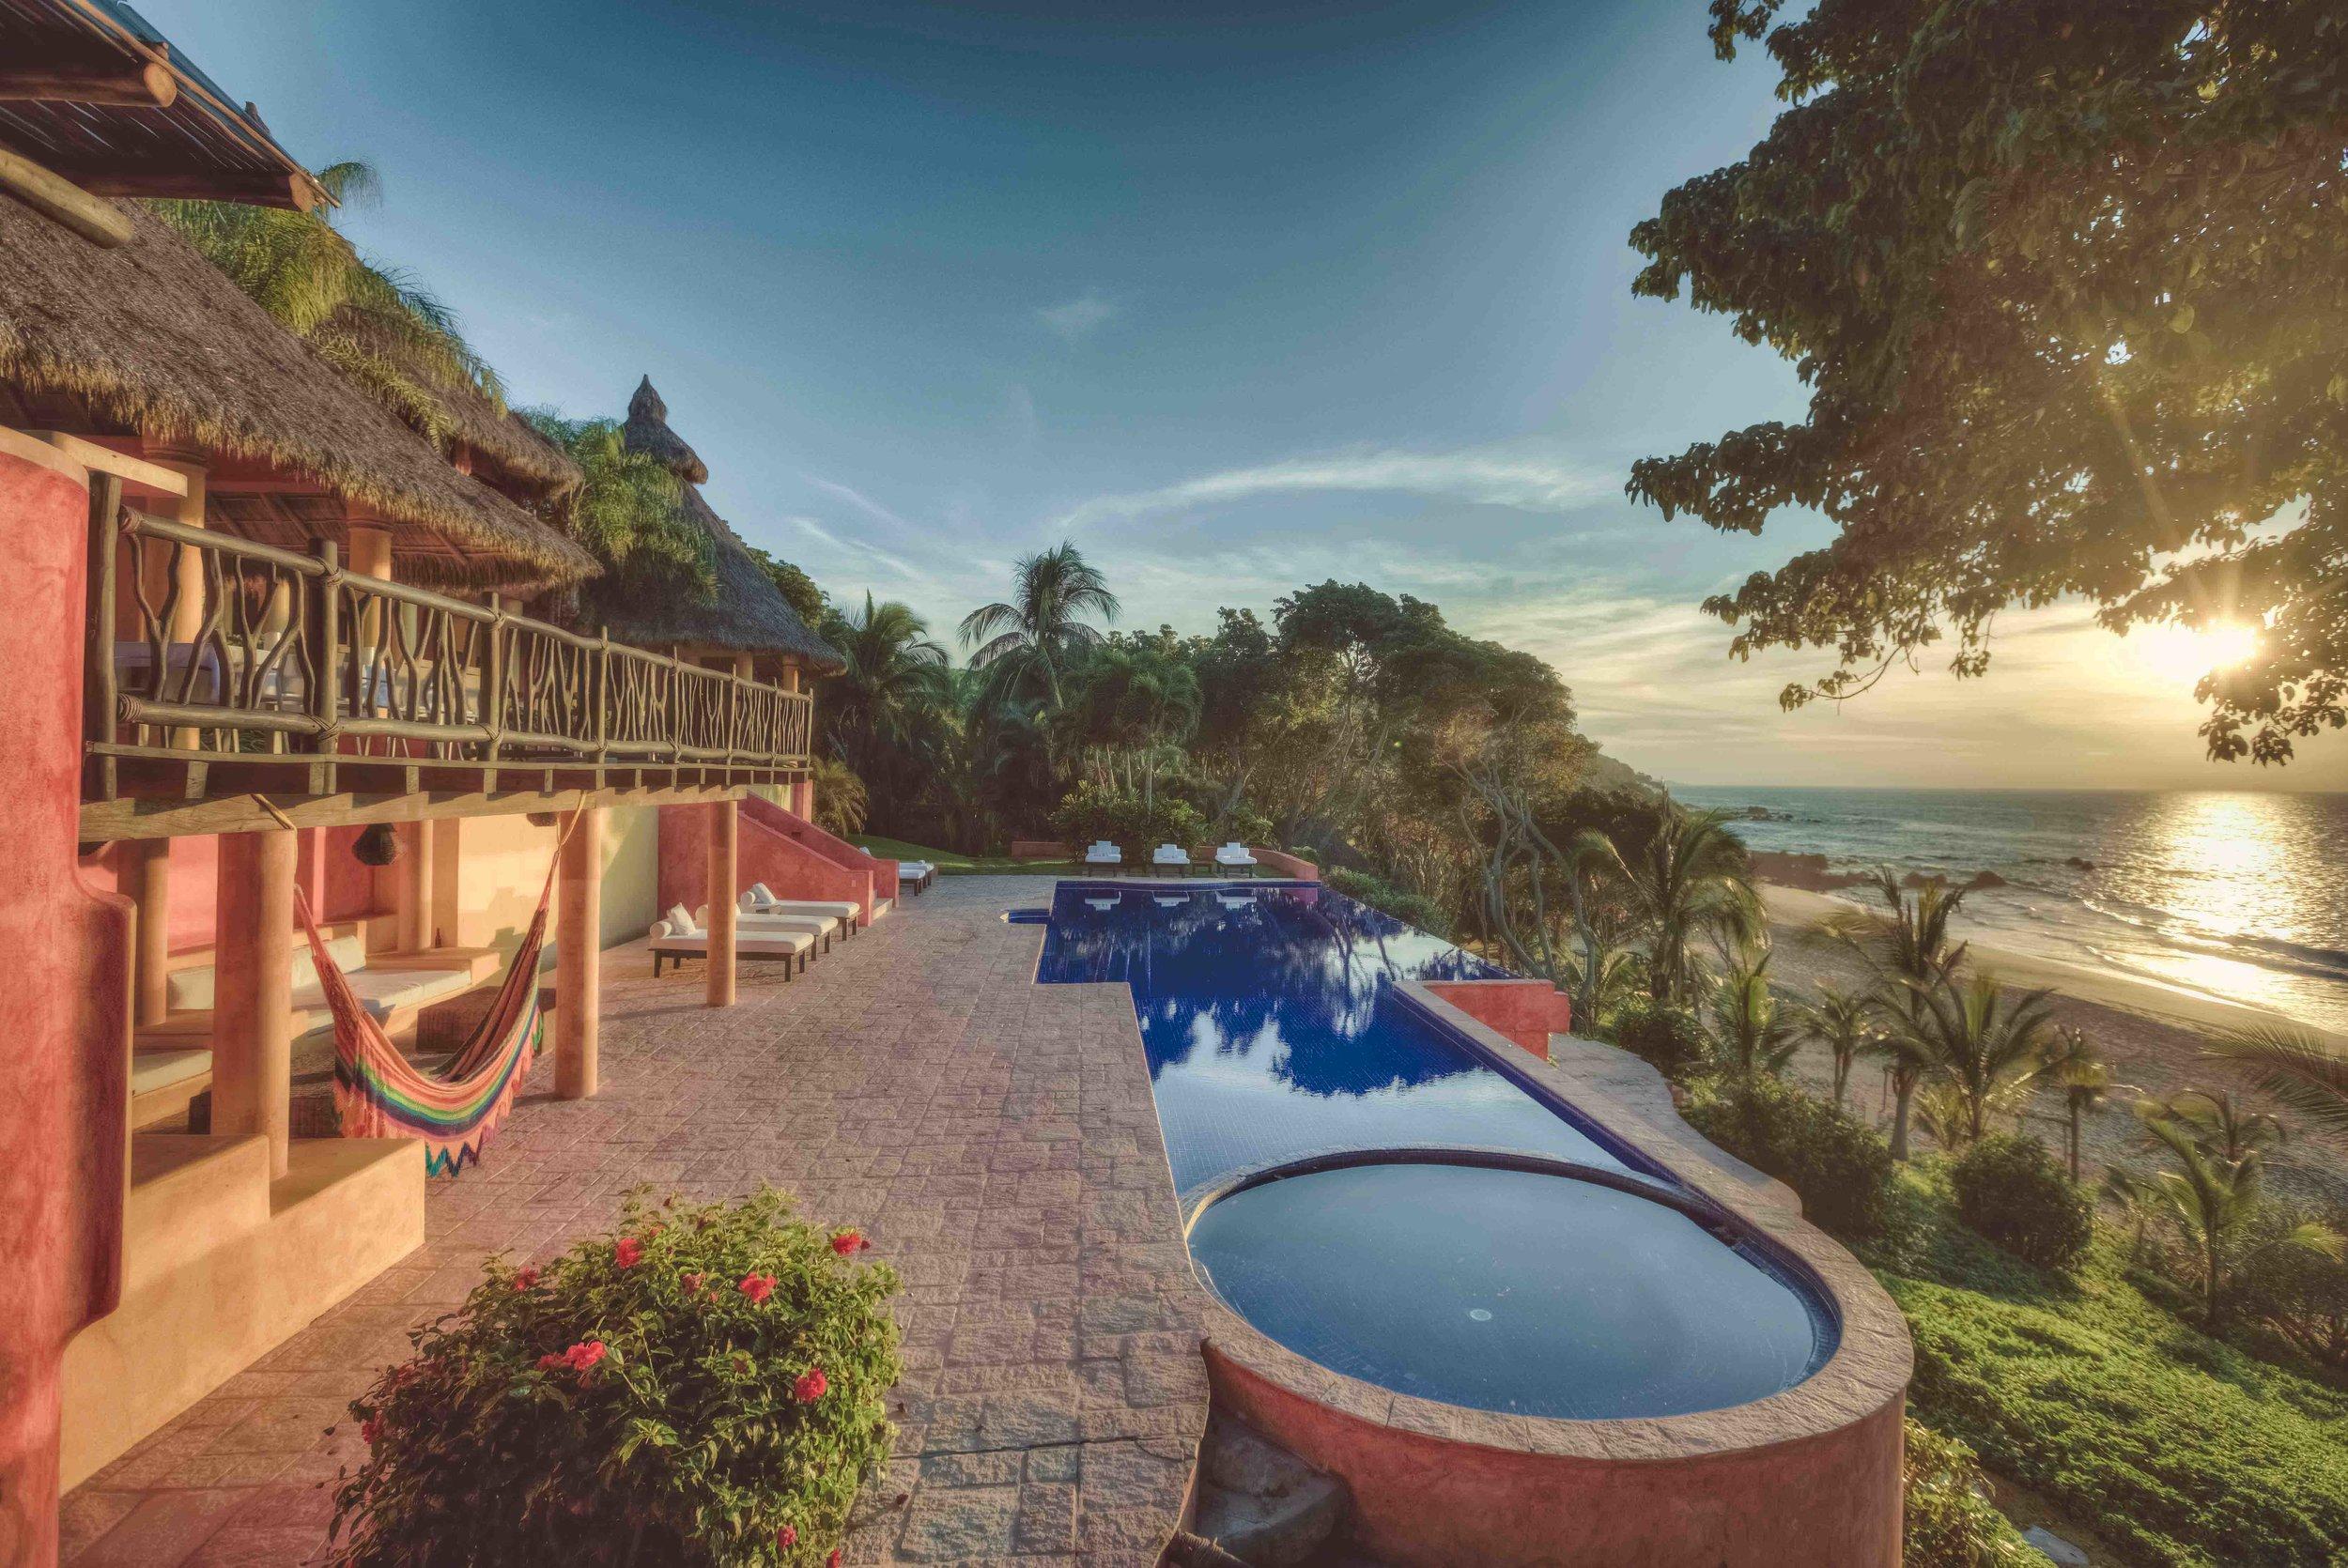 Luxury-Villa-Rental-Mexico-34.jpg